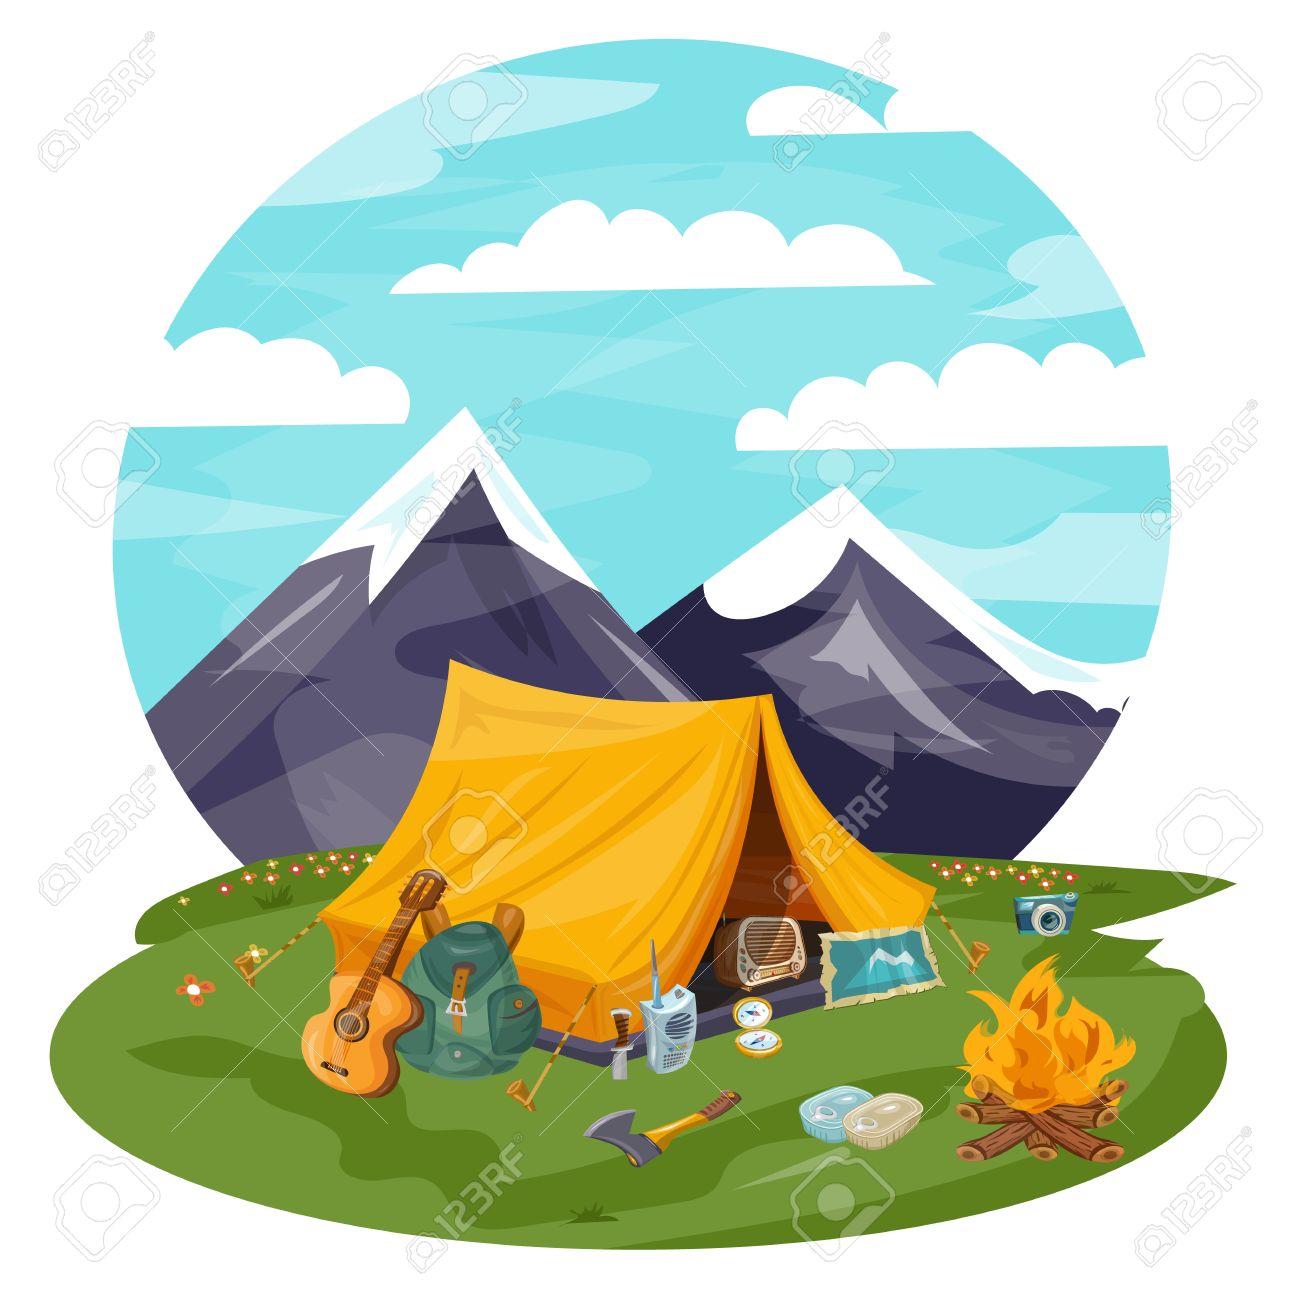 Camping Cartoon Images Free